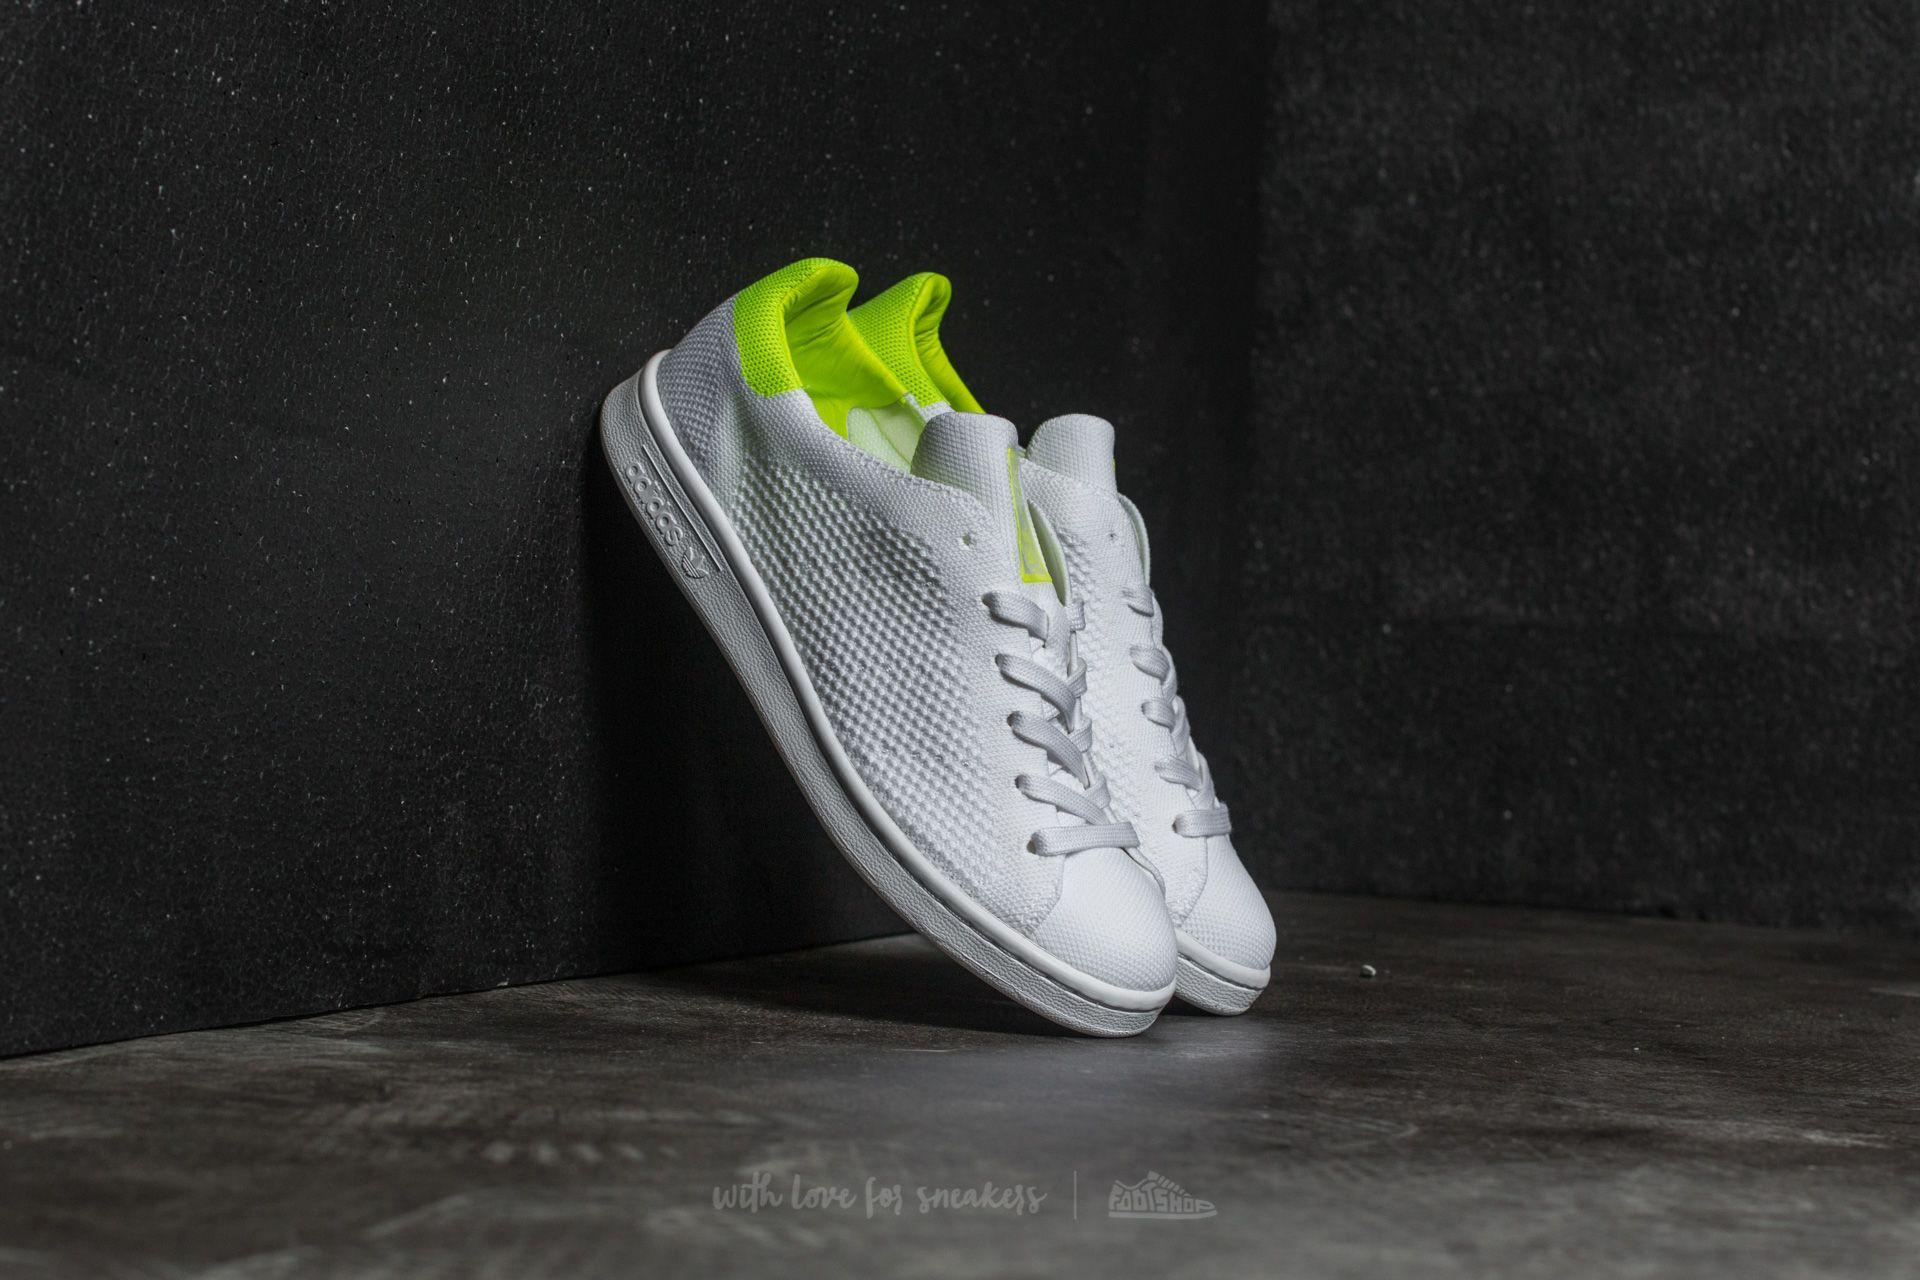 cfb1c6af0028 adidas W Stan Smith Primeknit Ftw White  Ftw White  Solar Yellow ...